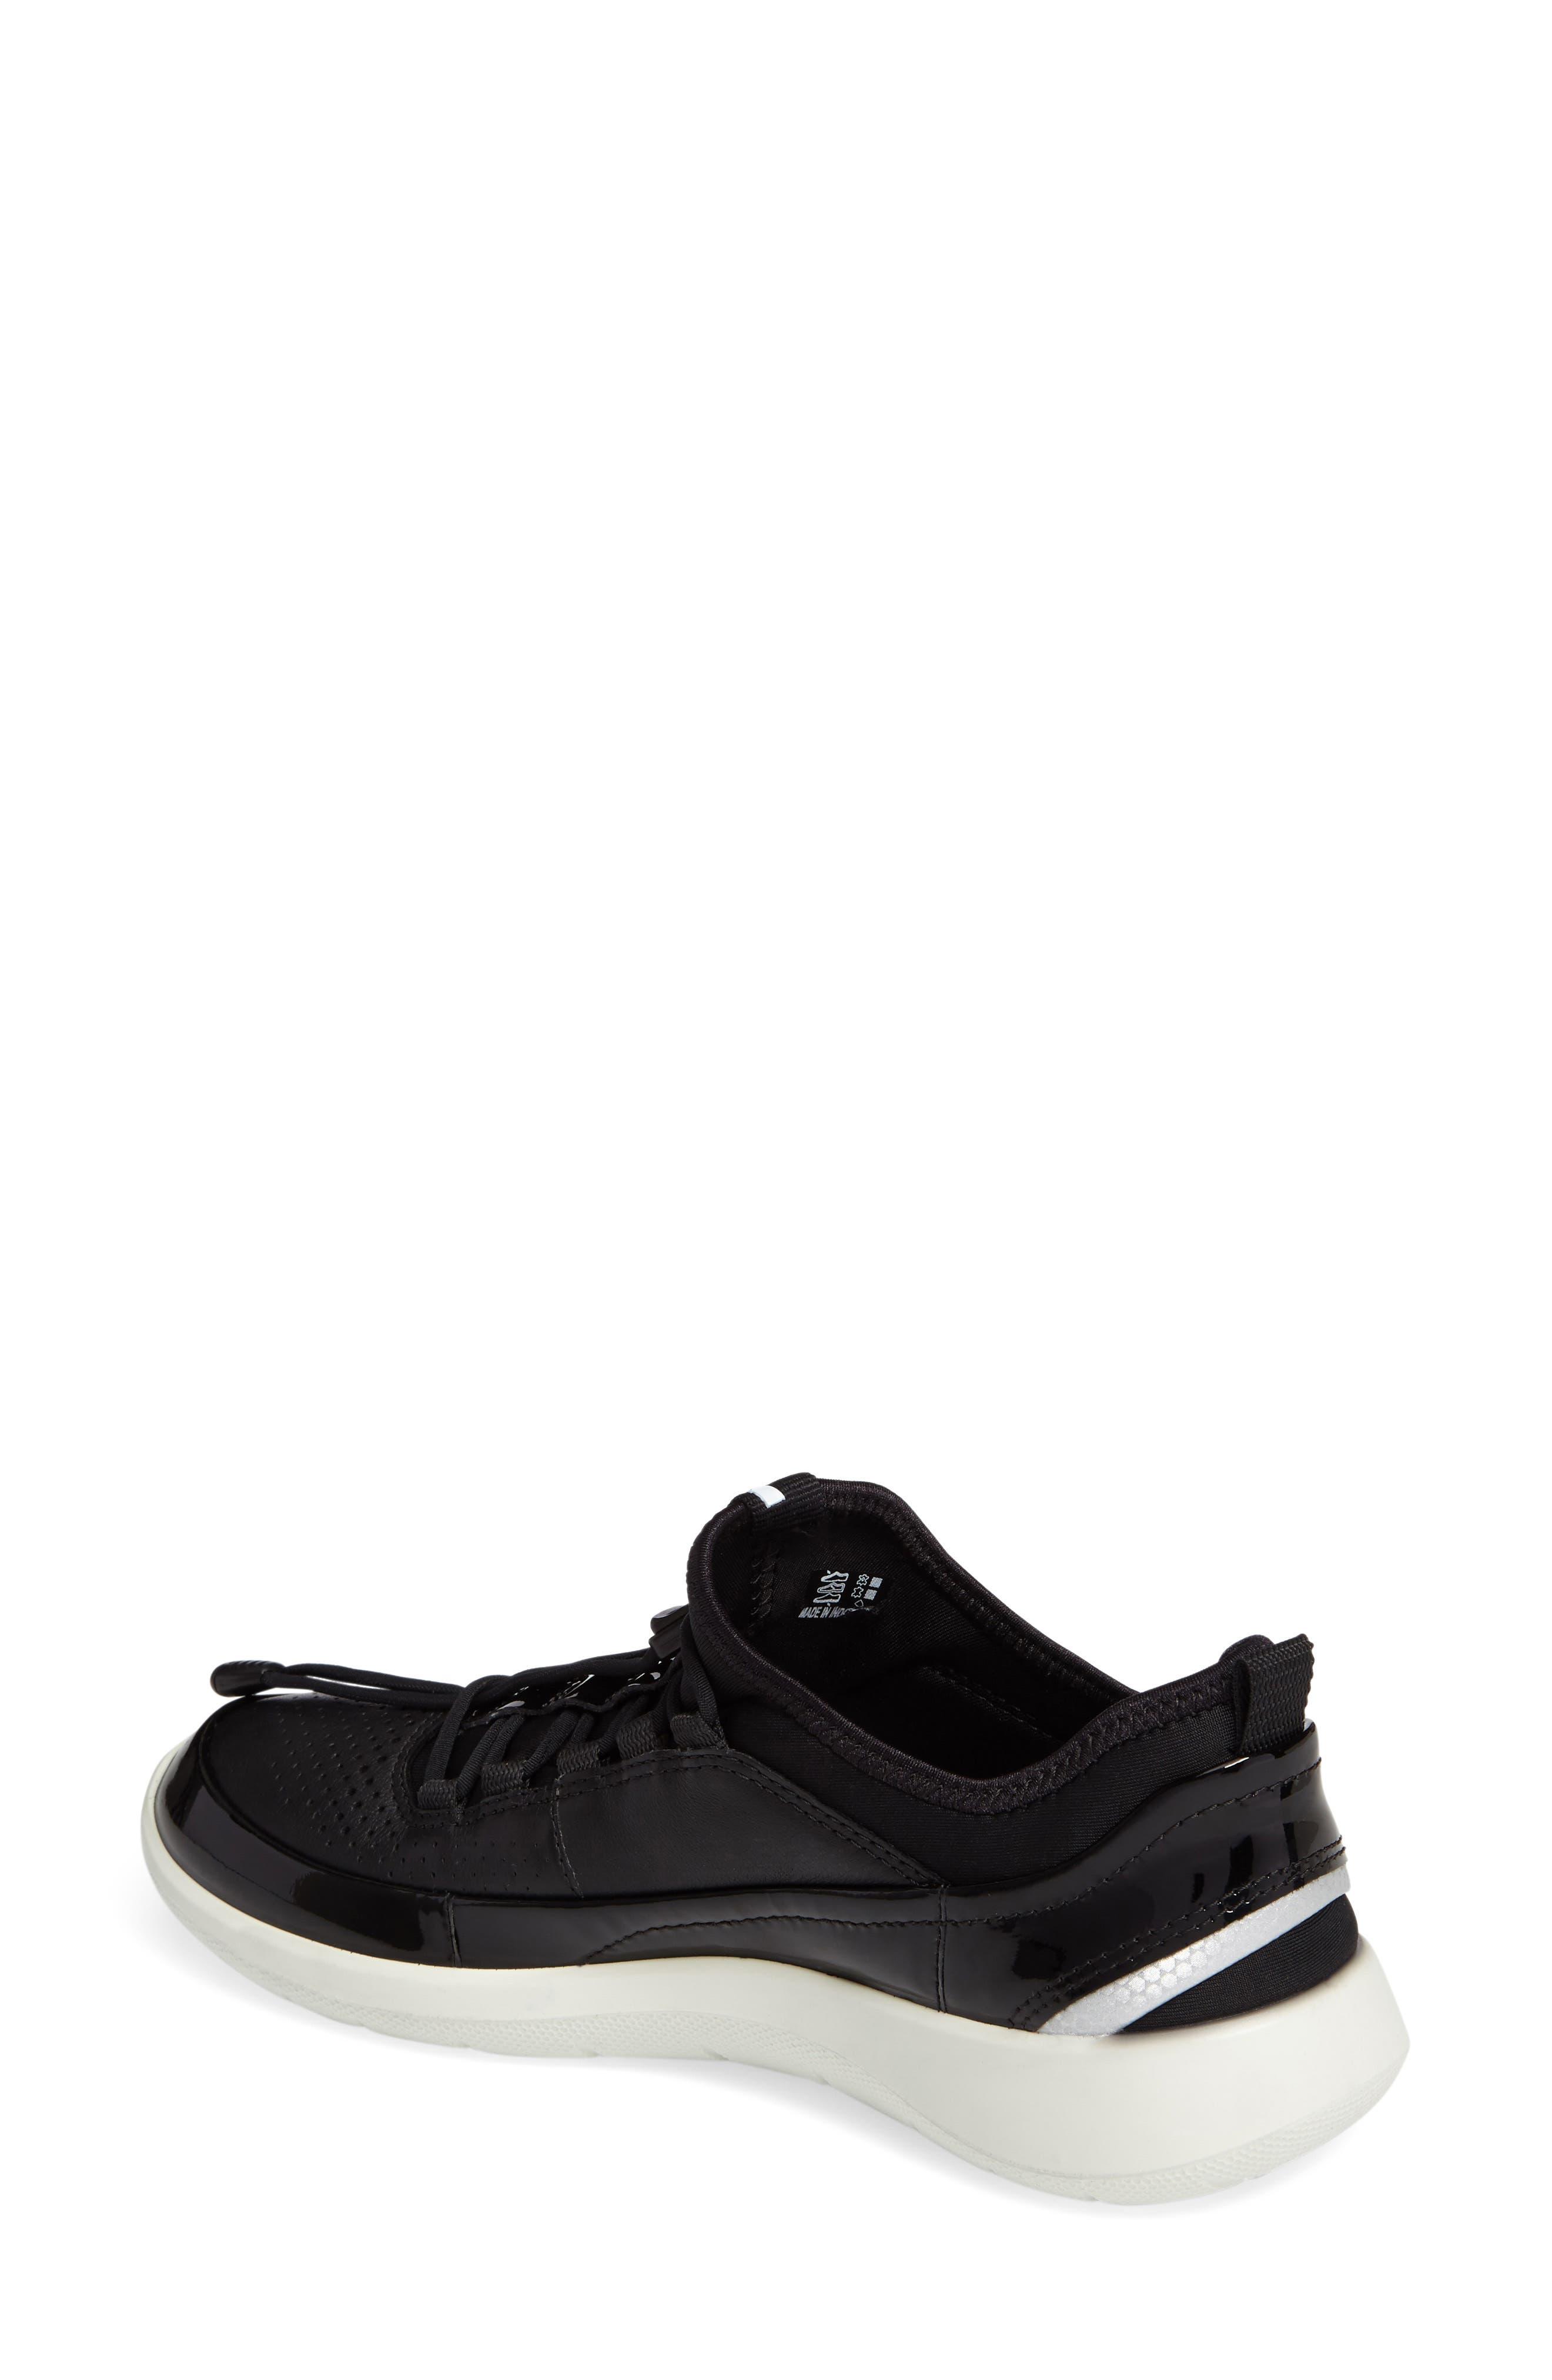 Soft 5 Sneaker,                             Alternate thumbnail 2, color,                             Black Leather